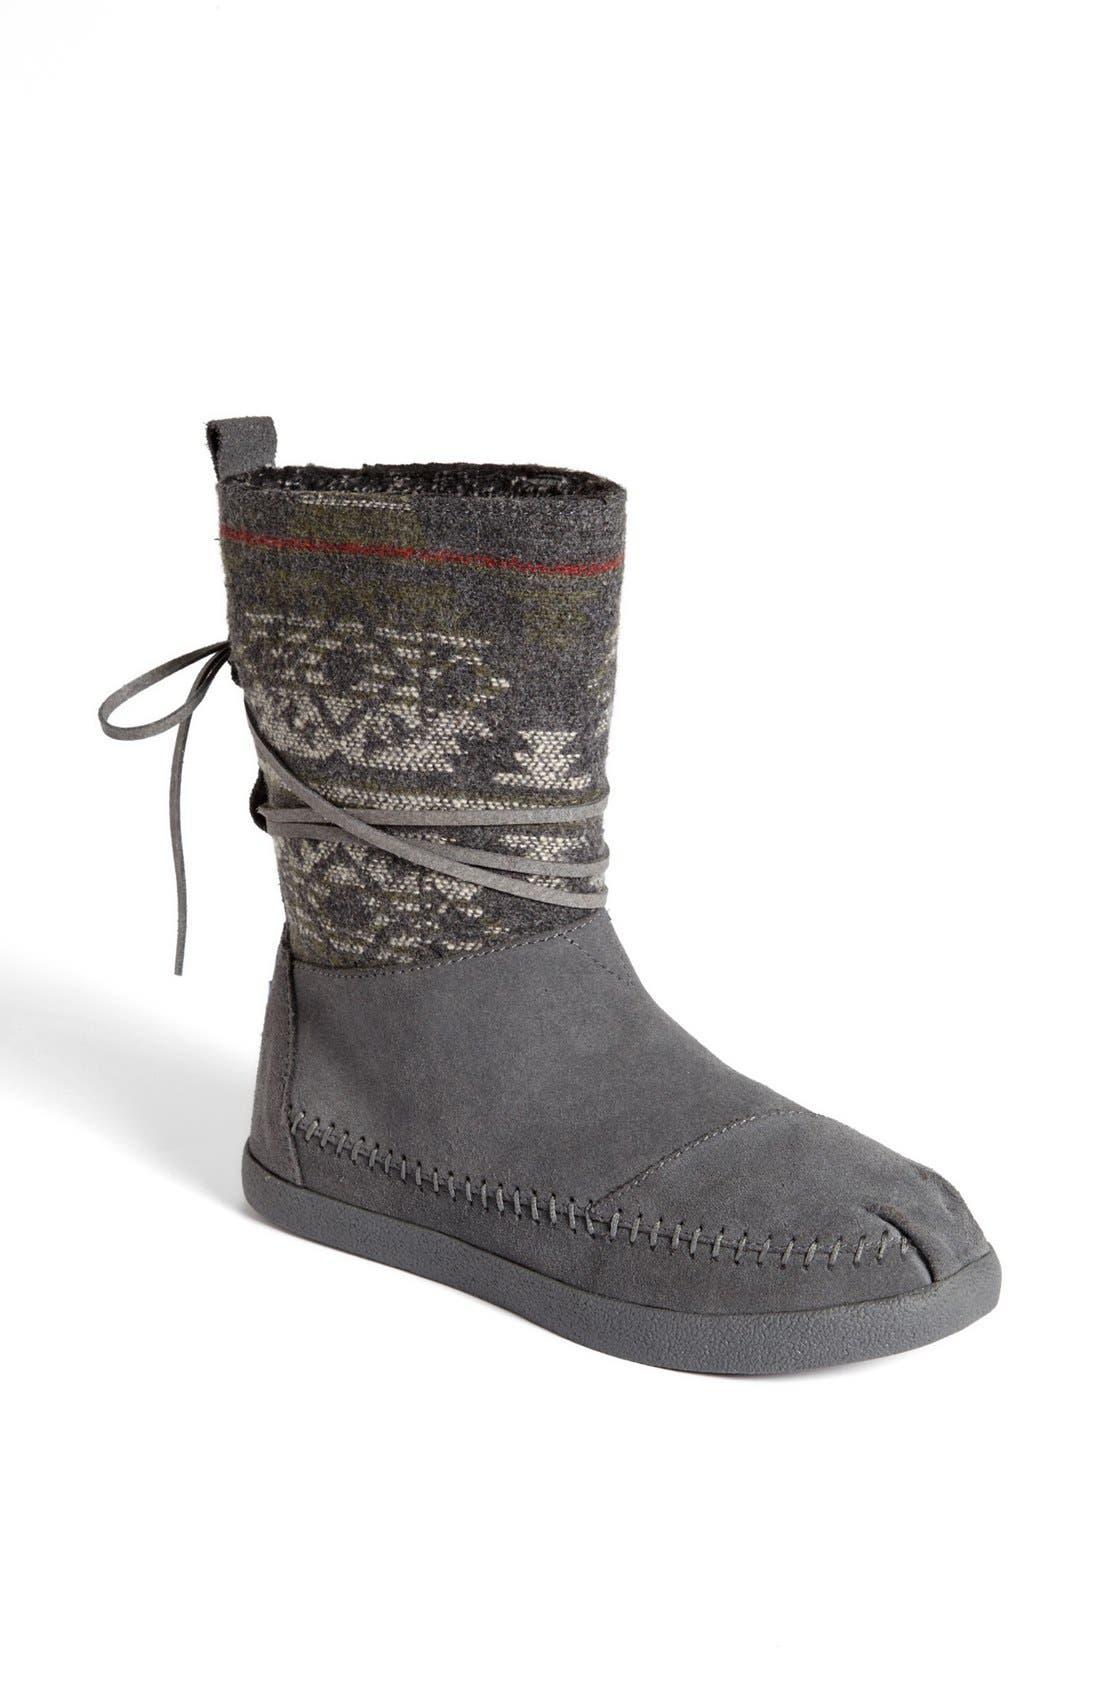 Main Image - TOMS 'Nepal - Jacquard' Boot (Women)